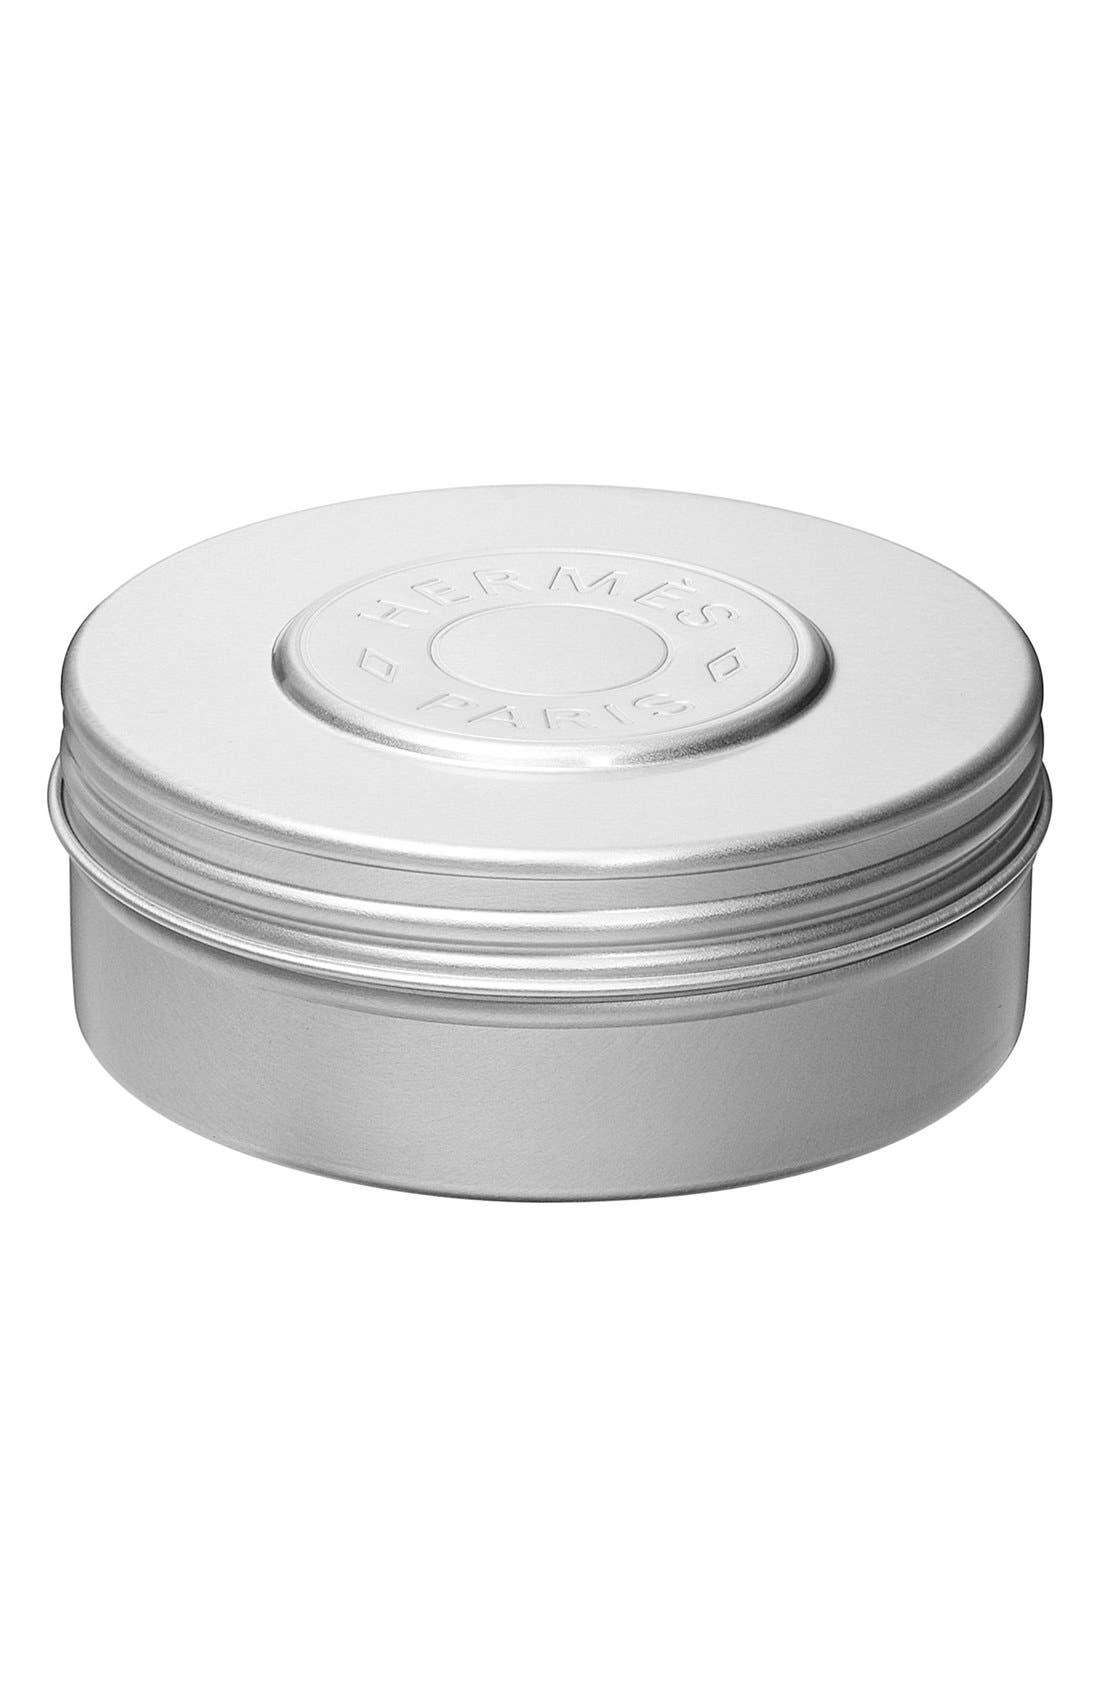 Hermès Eau de Rhubarbe Écarlate - Face and body moisturizing balm